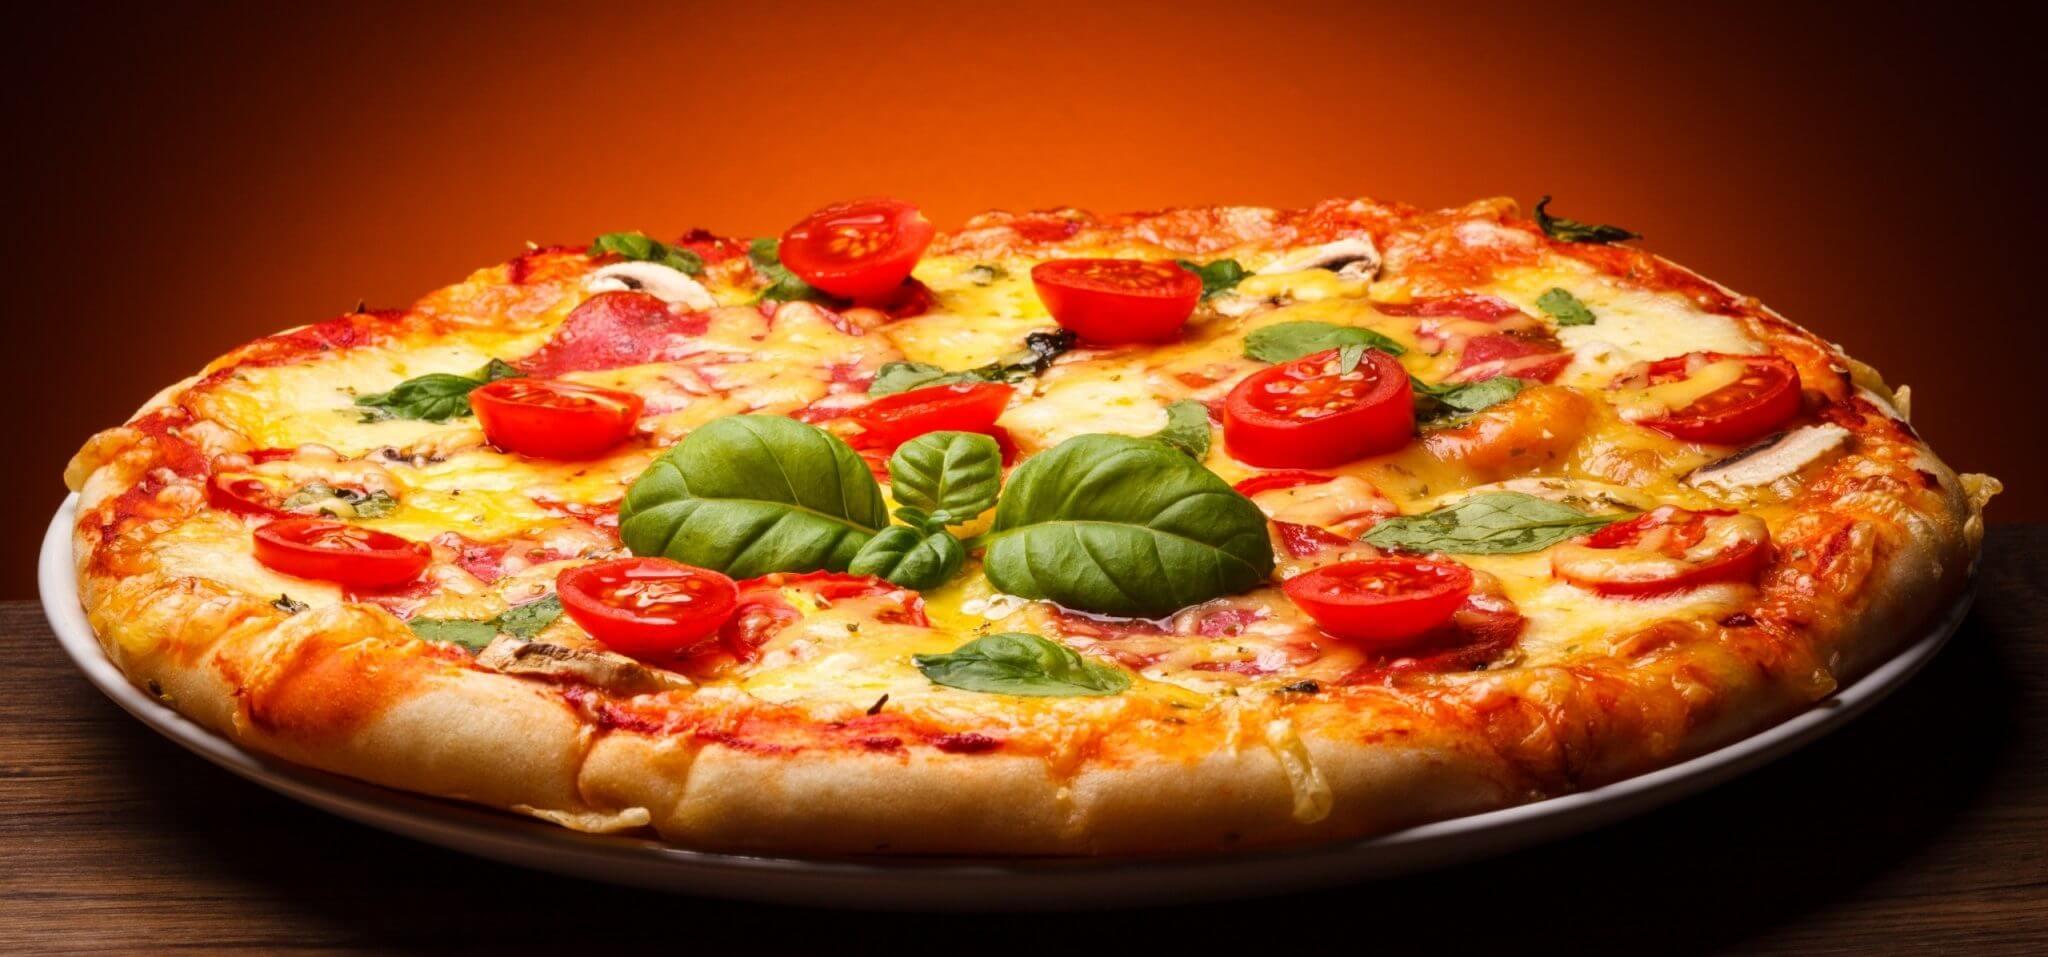 Tomate para una pizza saludable en Aporpizza